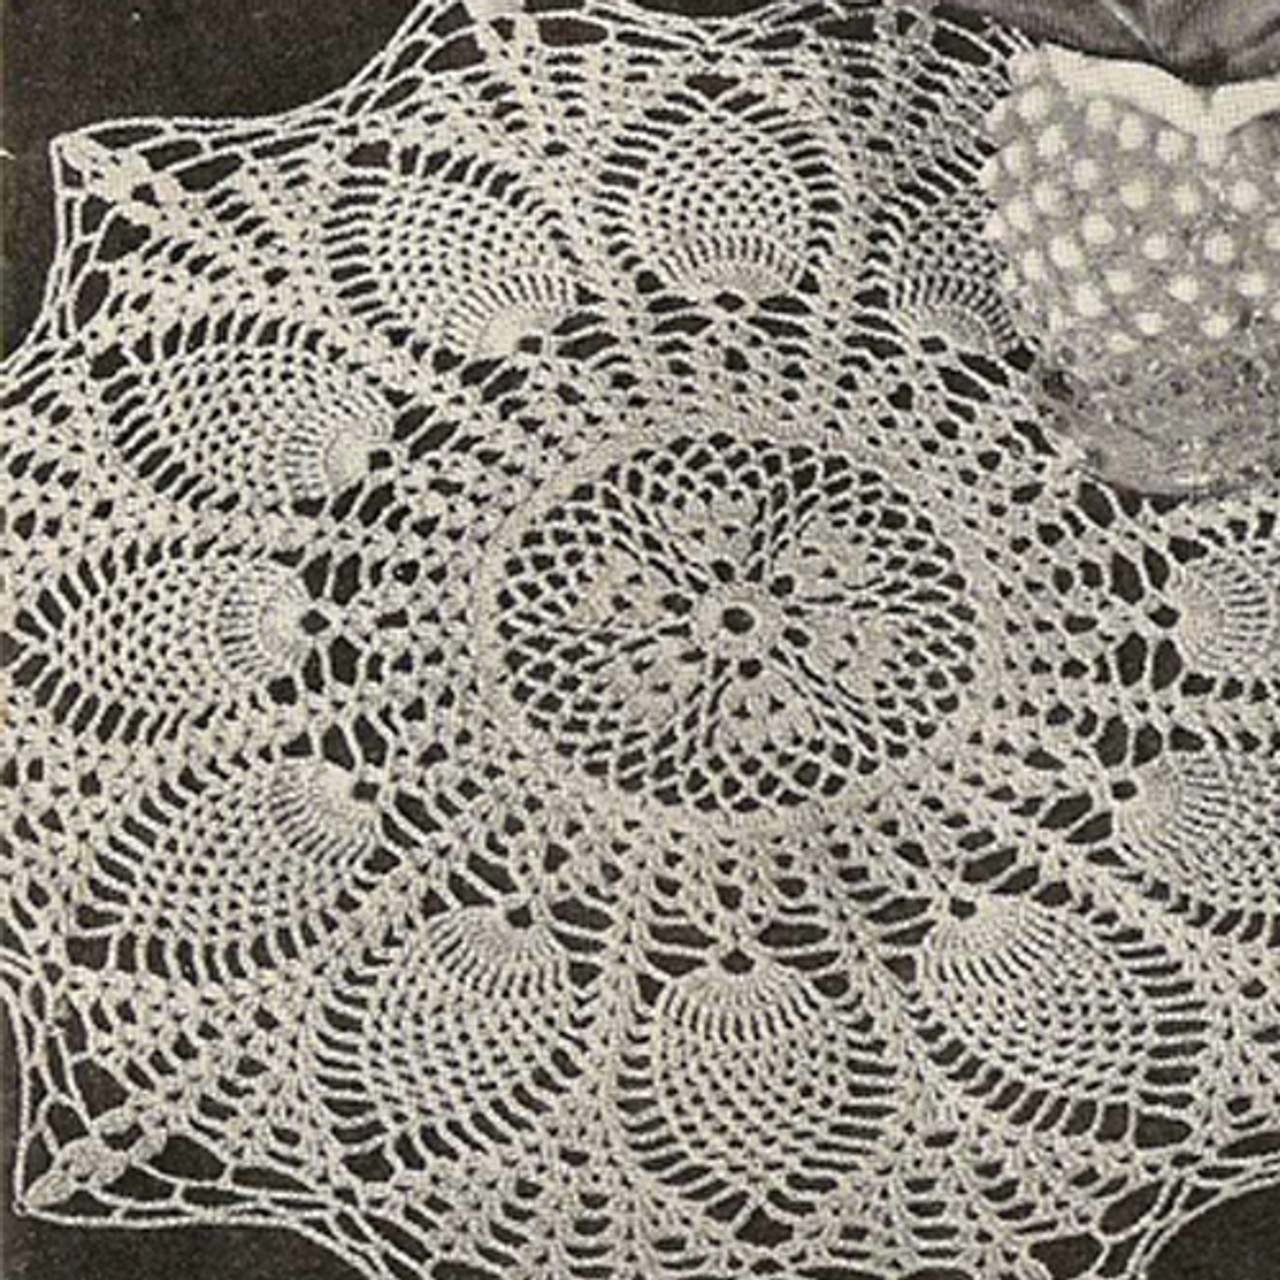 Sunburst Crochet Doily Pattern in Pineapple Stitch